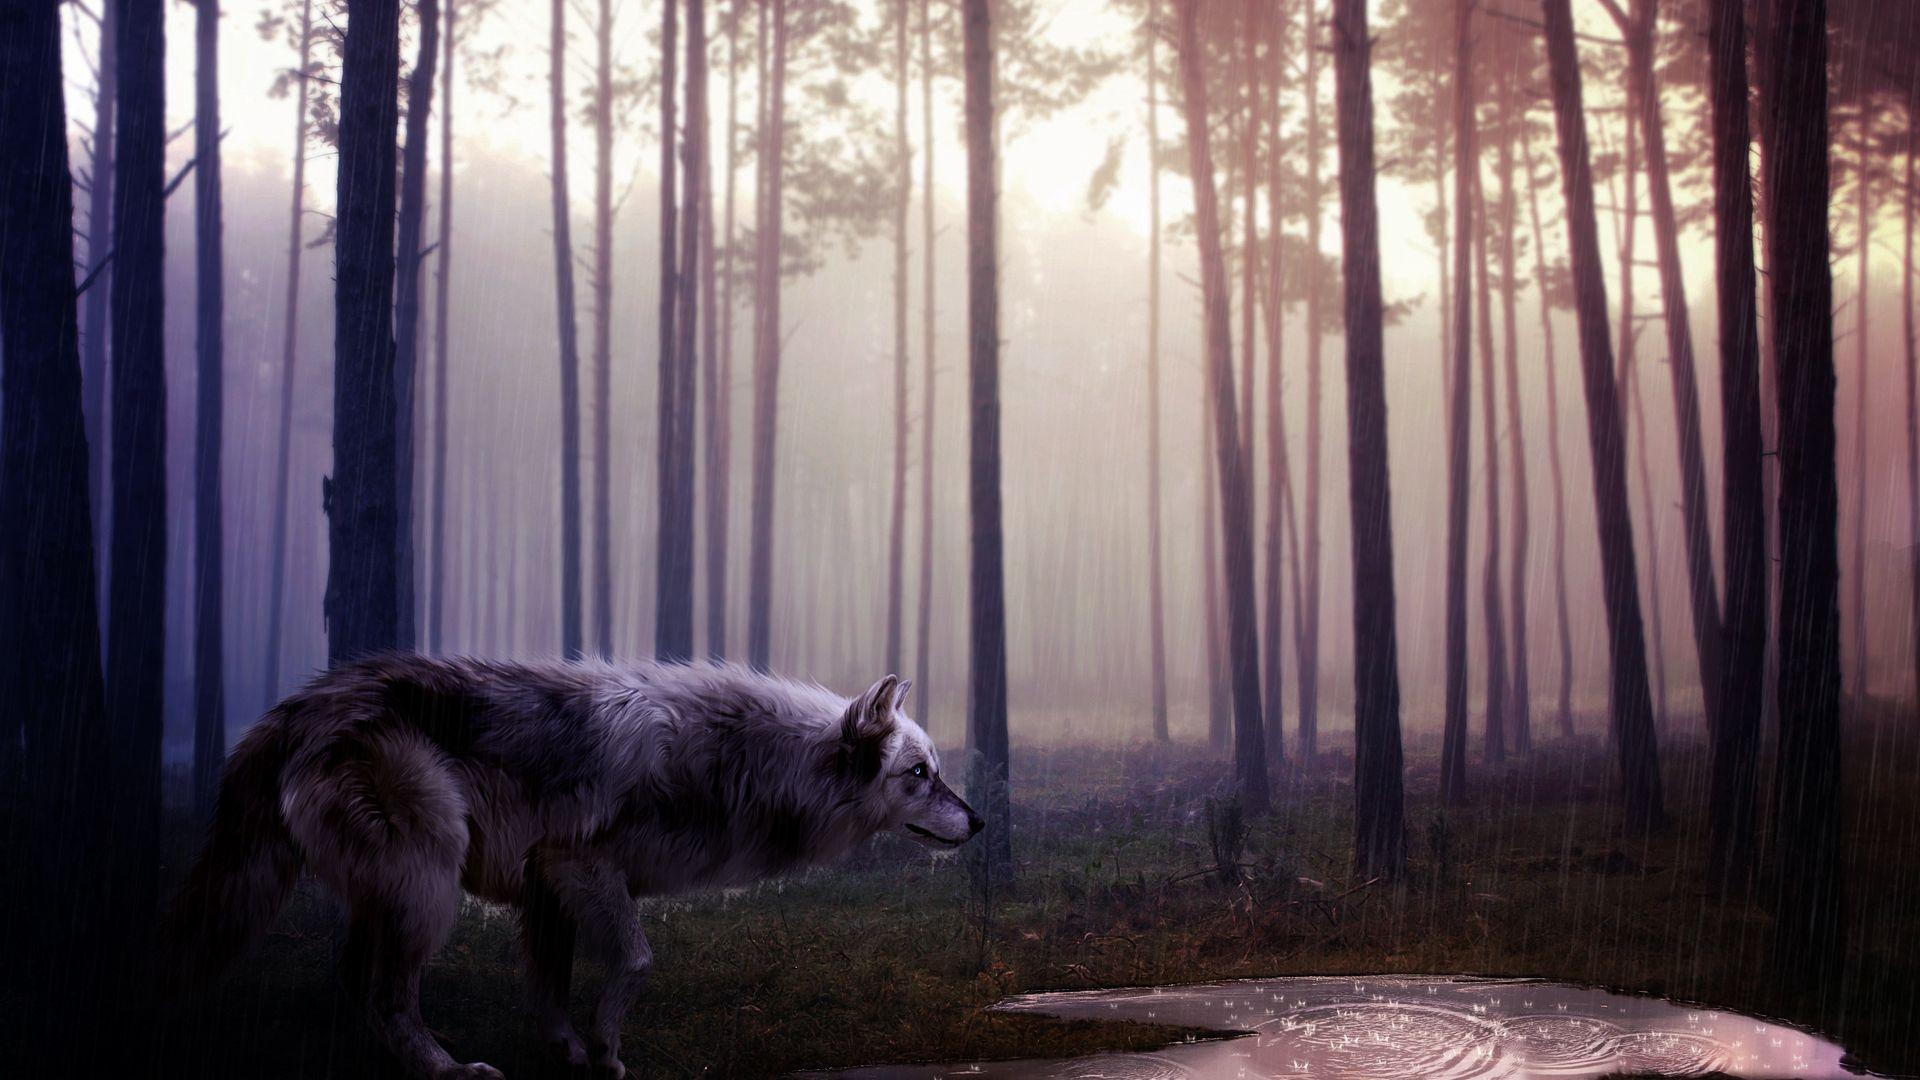 1920x1080 Wild Wolf hình nền